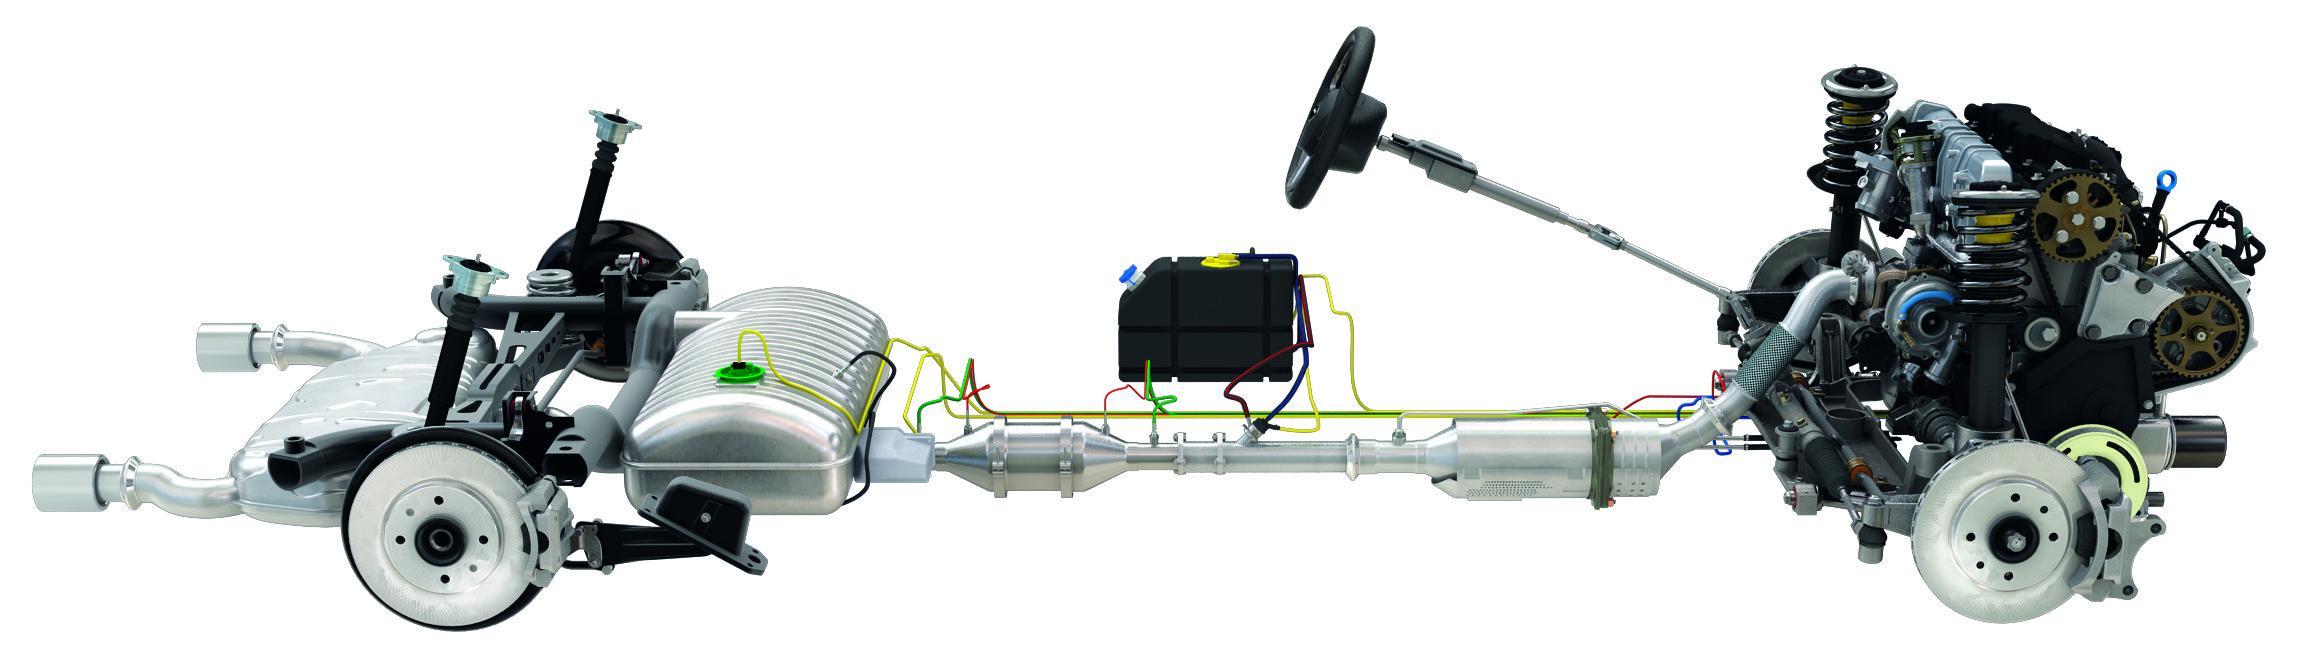 Imporfase-wireframes-full-car-walker